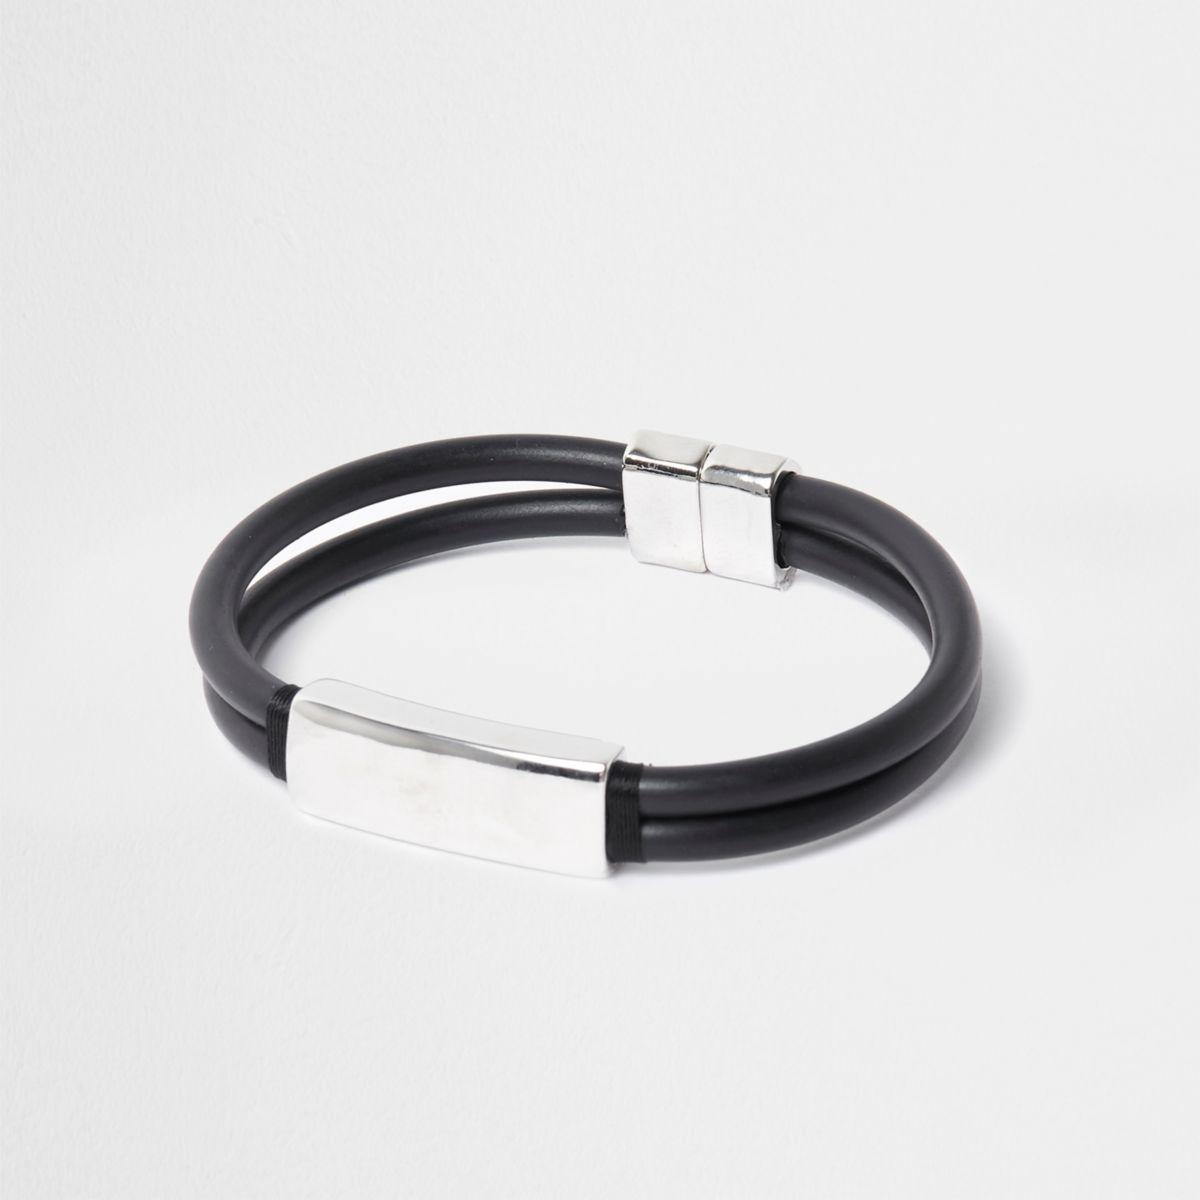 Black rubber and silver tone magnet bracelet